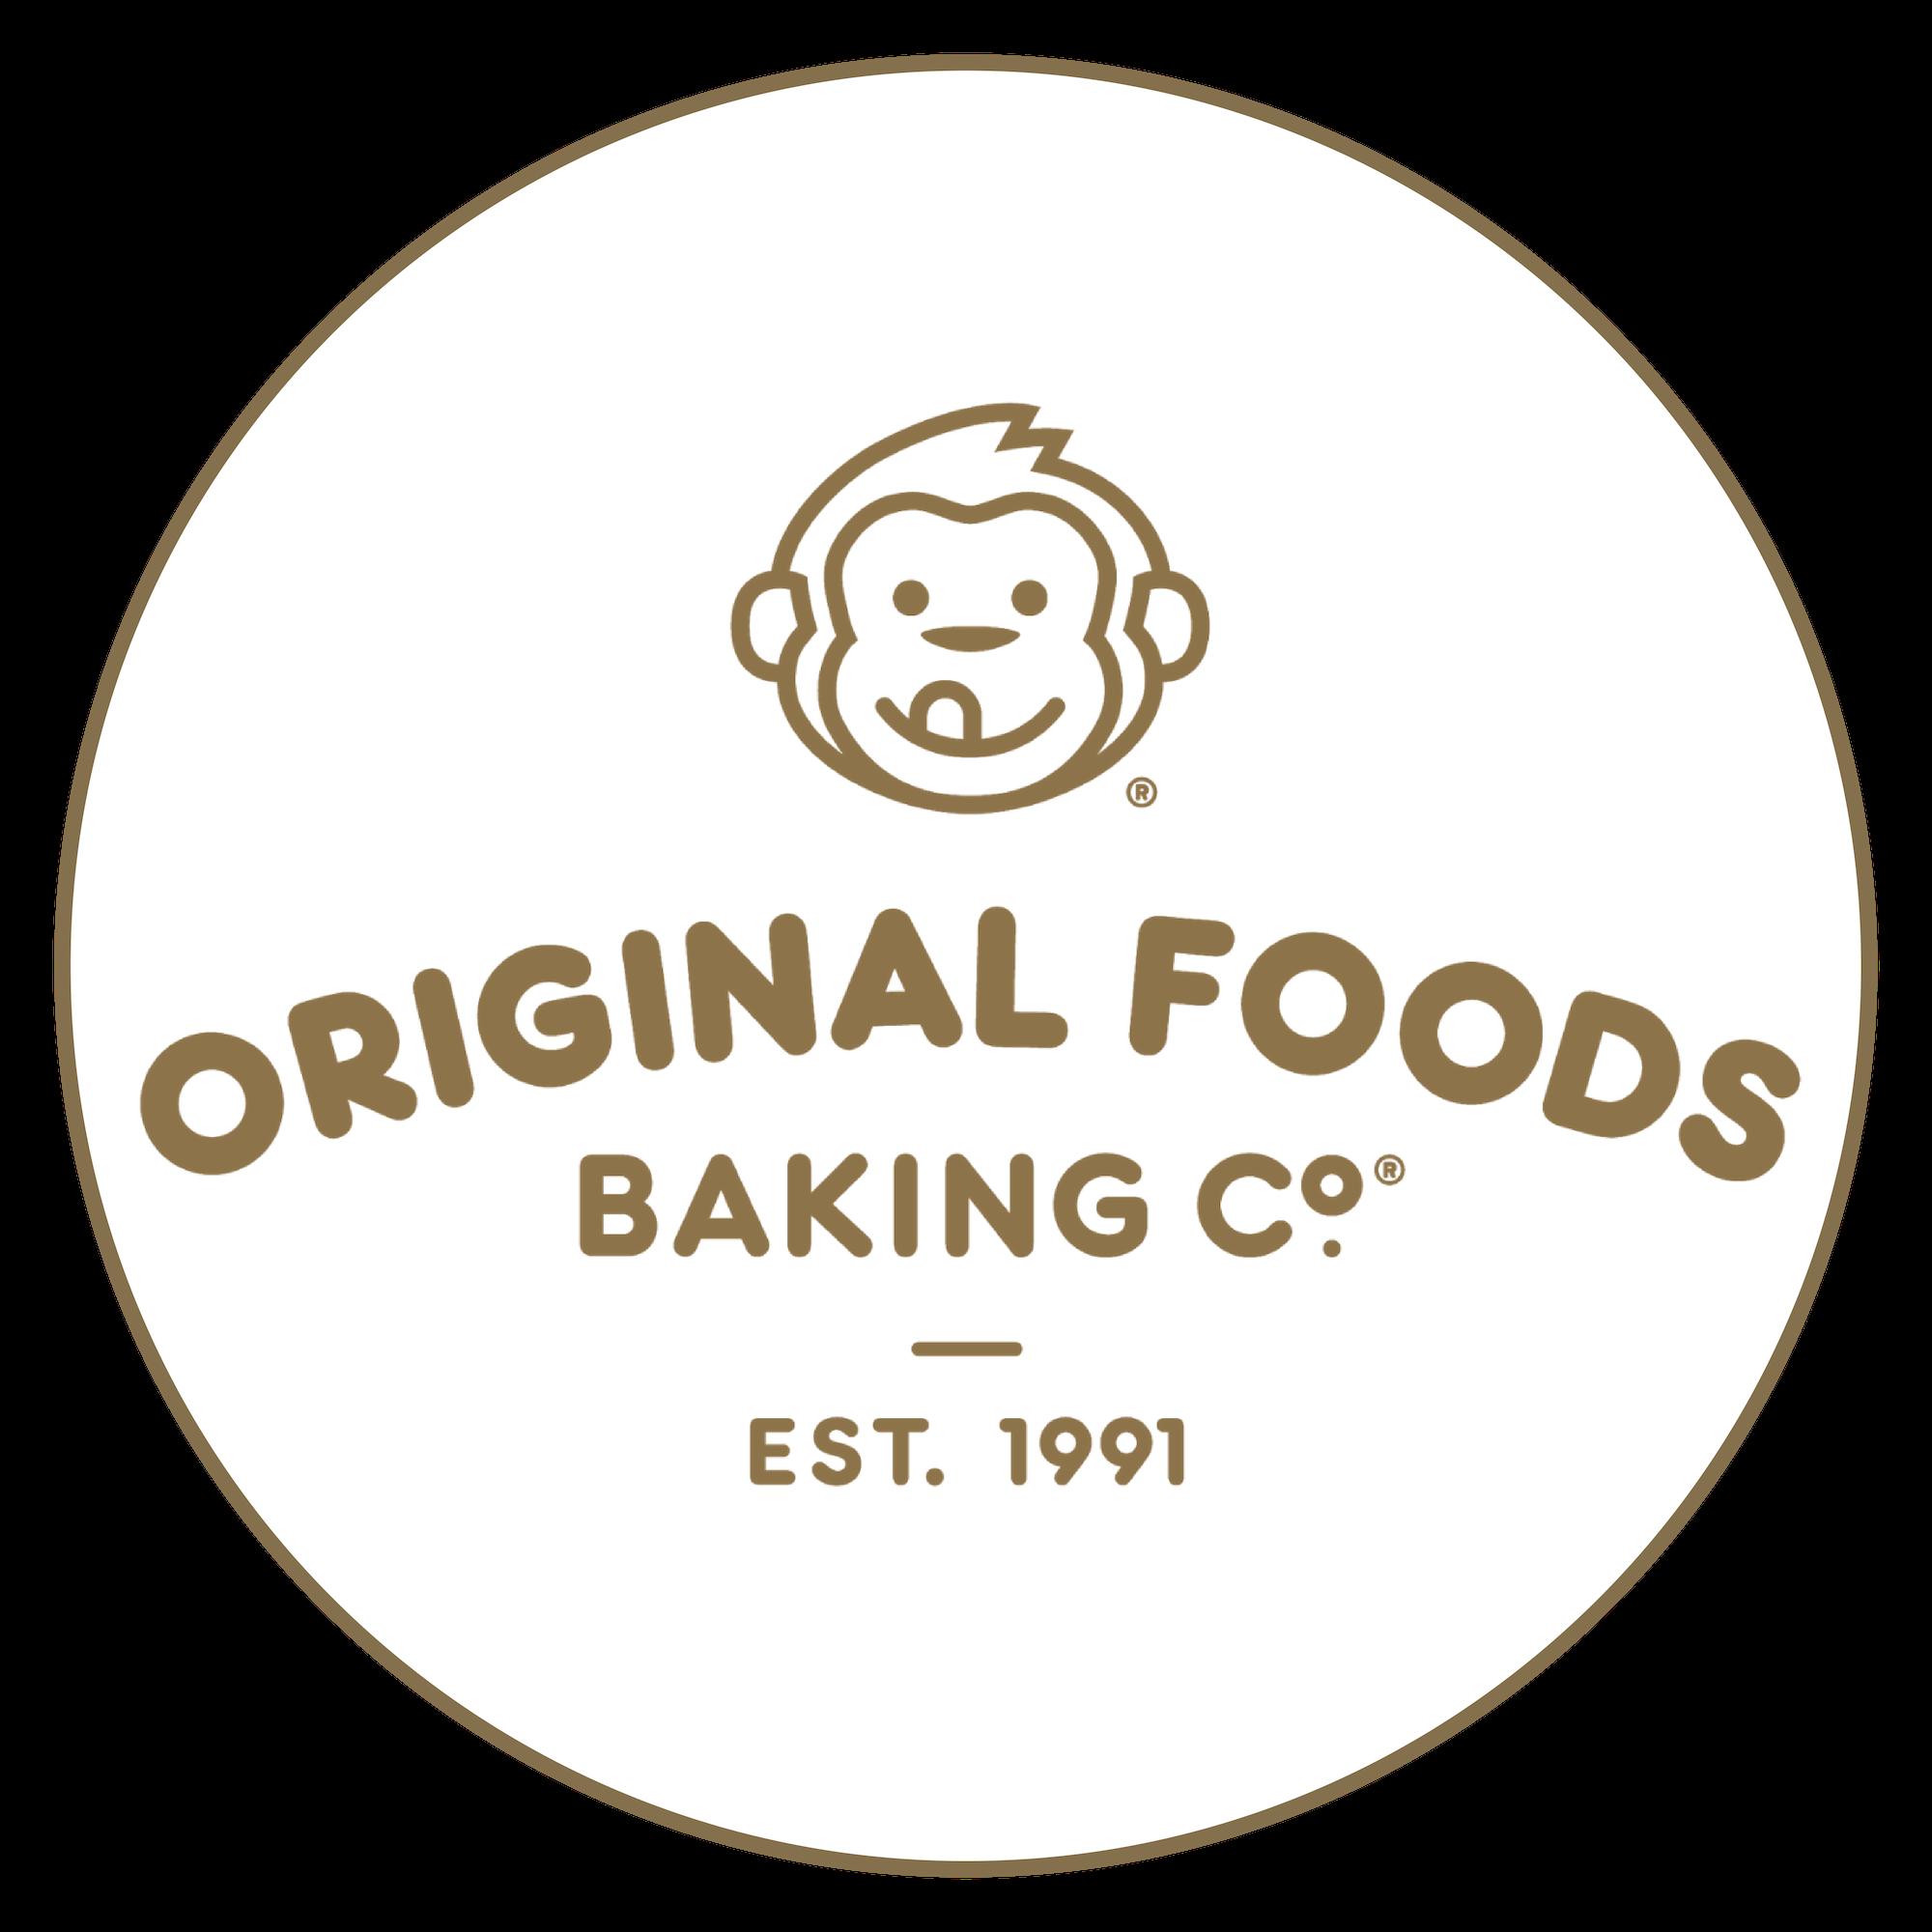 Original Foods Baking Co.